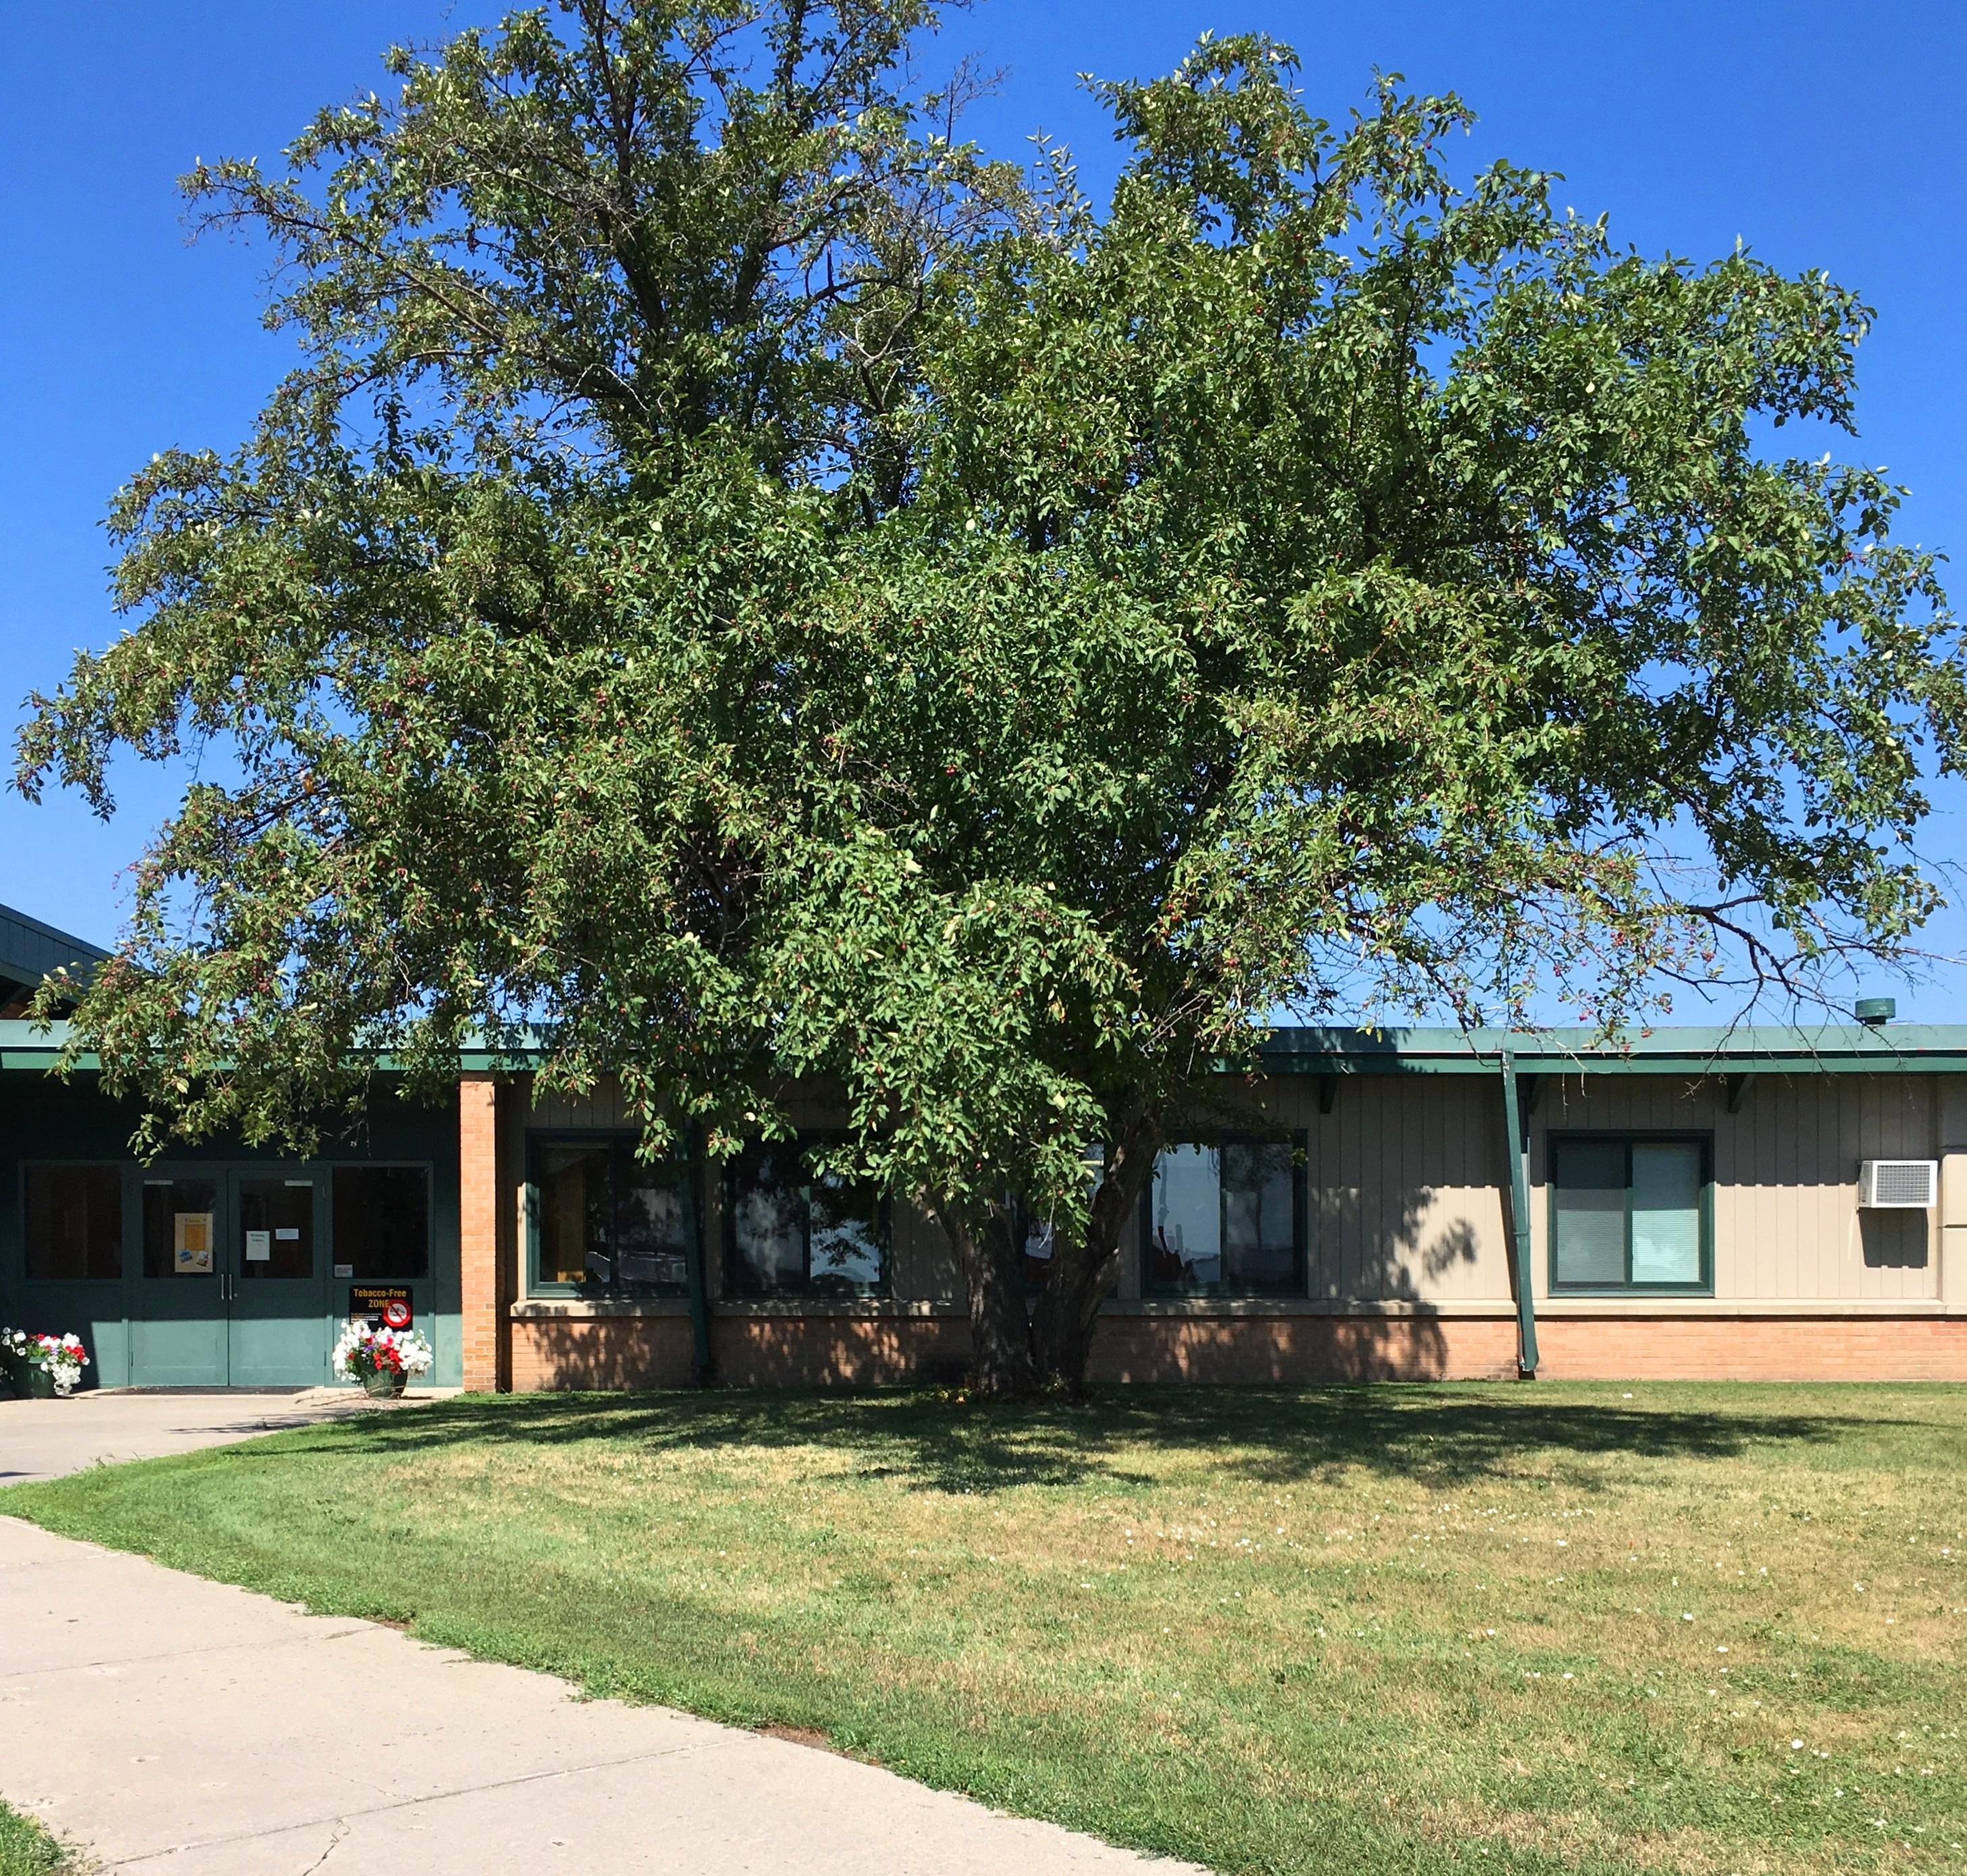 Peter J. Boe Elementary School